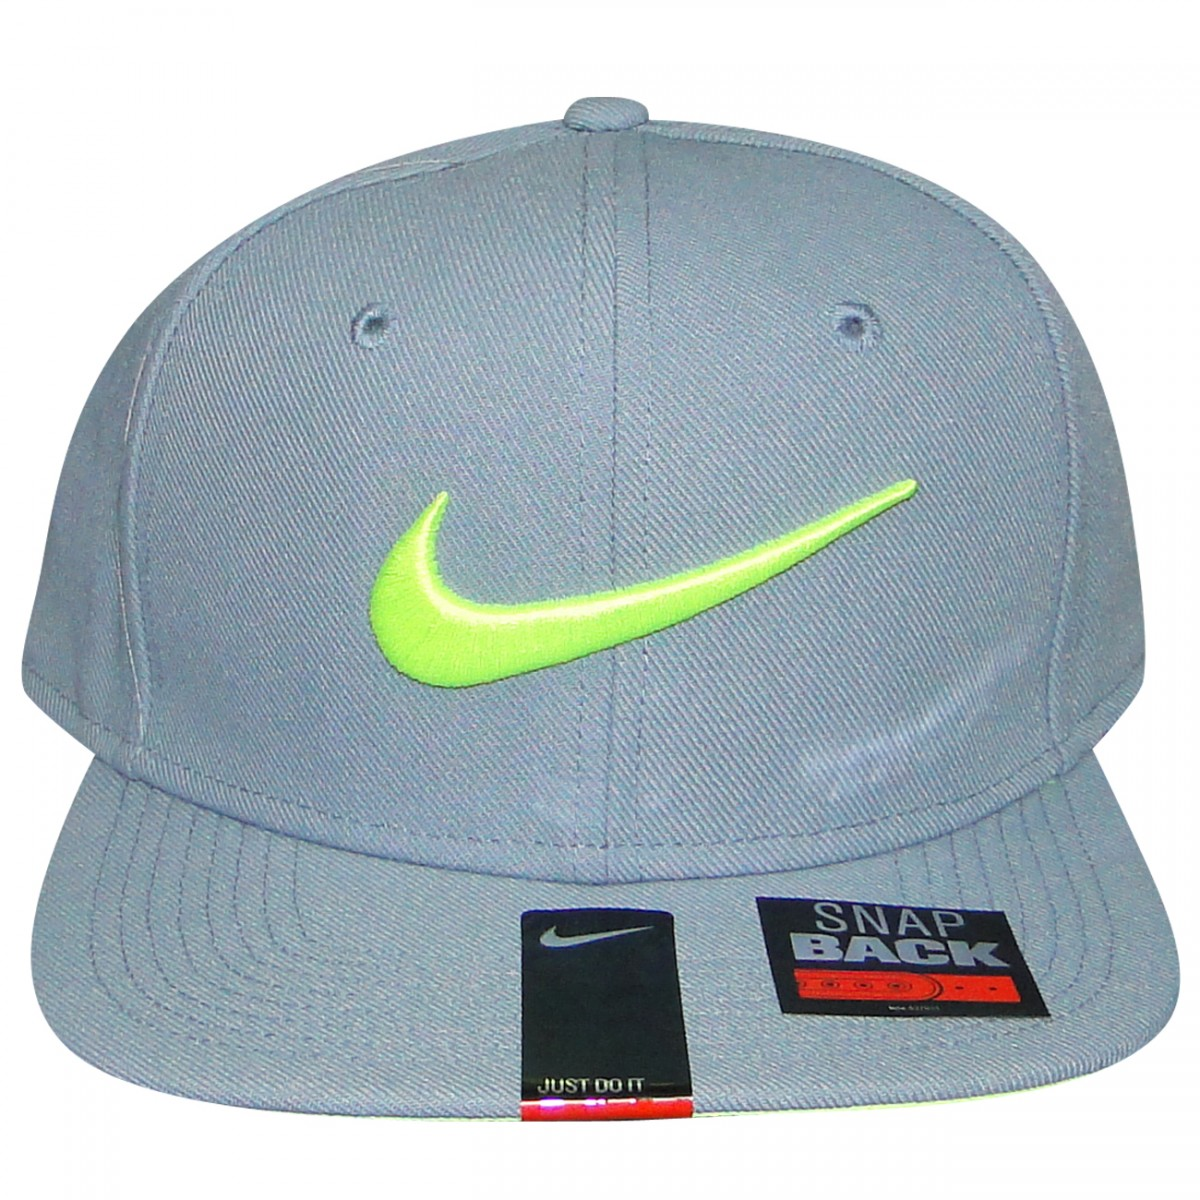 41b04d8a8c683 Bone Nike 639534 639534-088 - Cinza Limão - Chuteira Nike